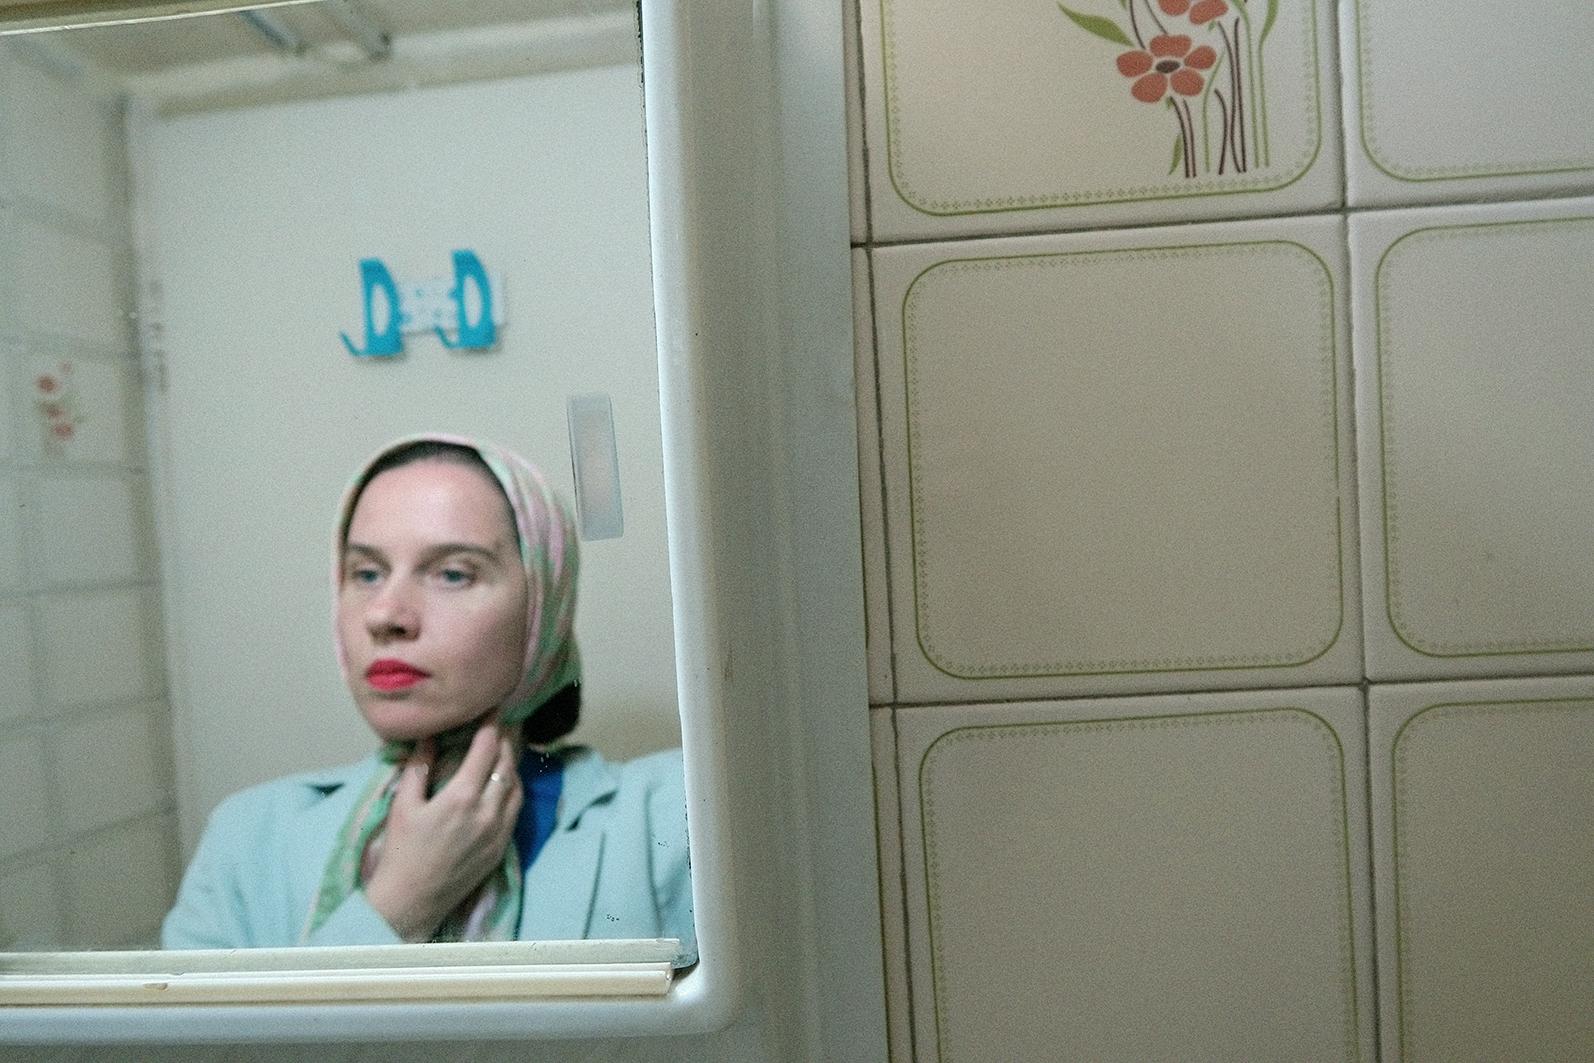 Aneta Grzeszykowska   Iranian Film Still #1 , 2015  Pigment ink on cotton paper  100 x 66.5 cm